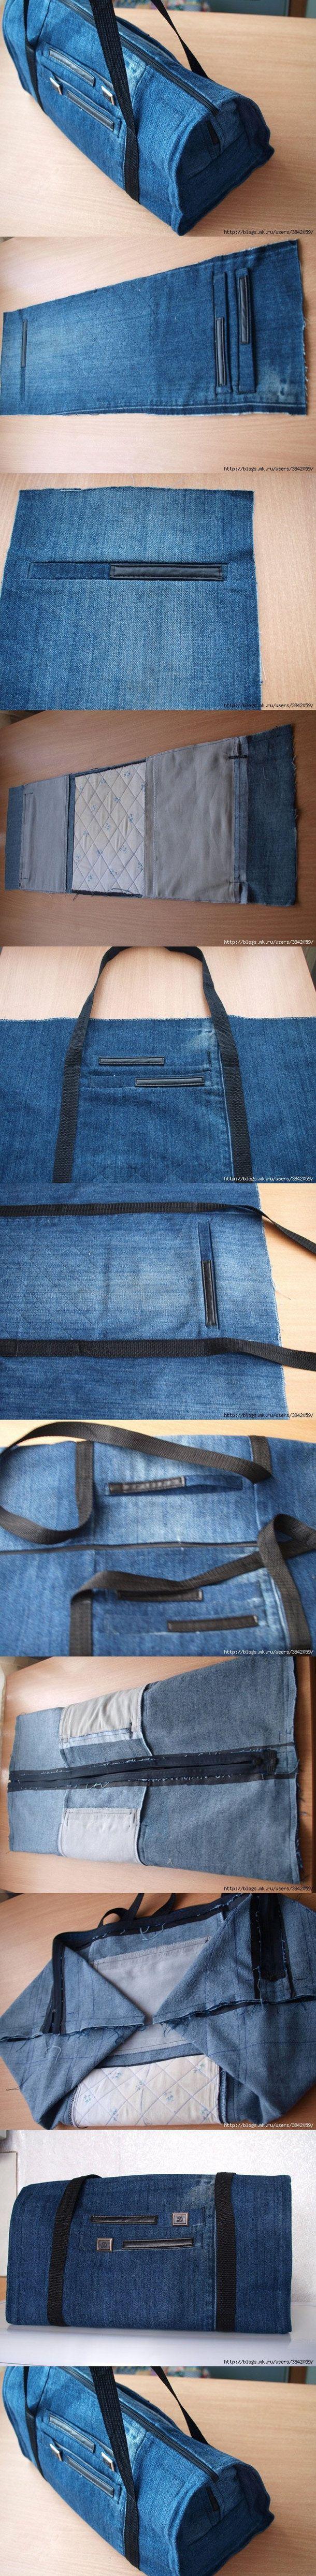 Torba podróżna z jeansów